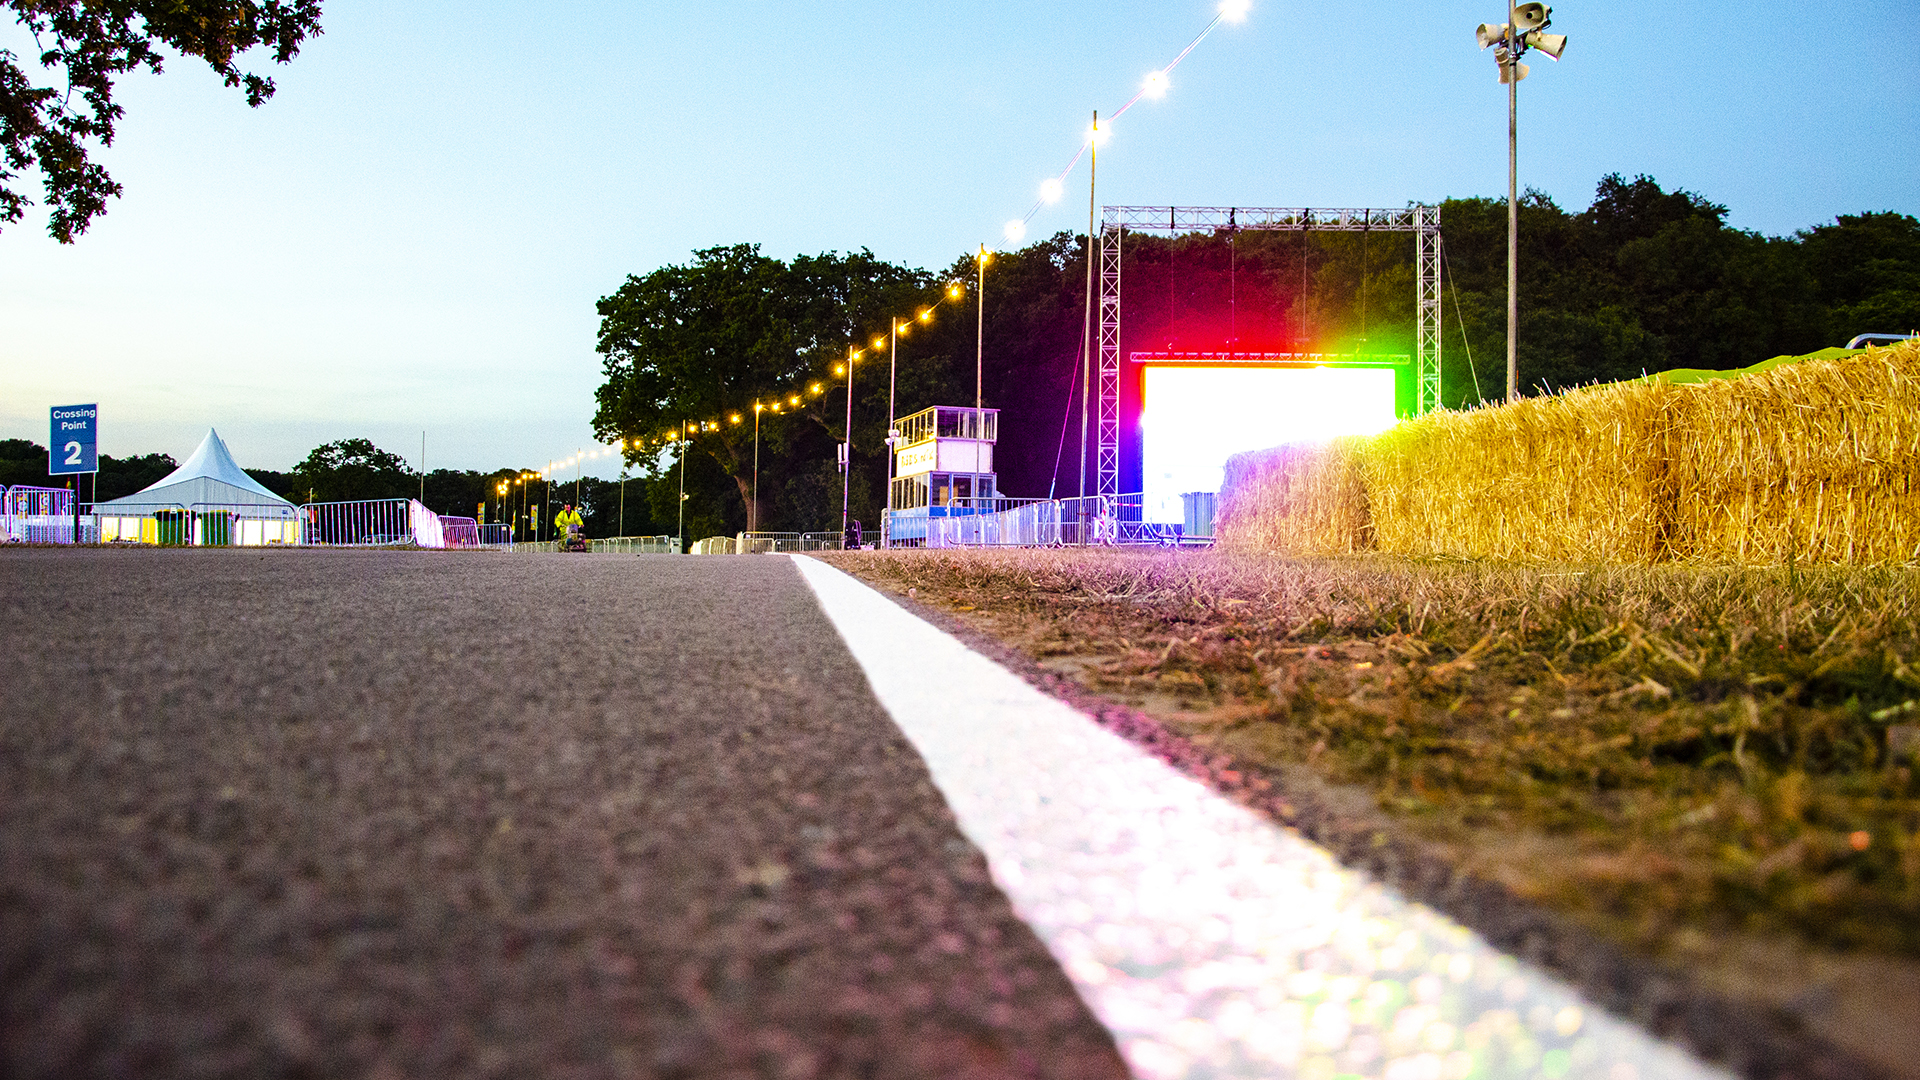 Carfest Road Marking 31